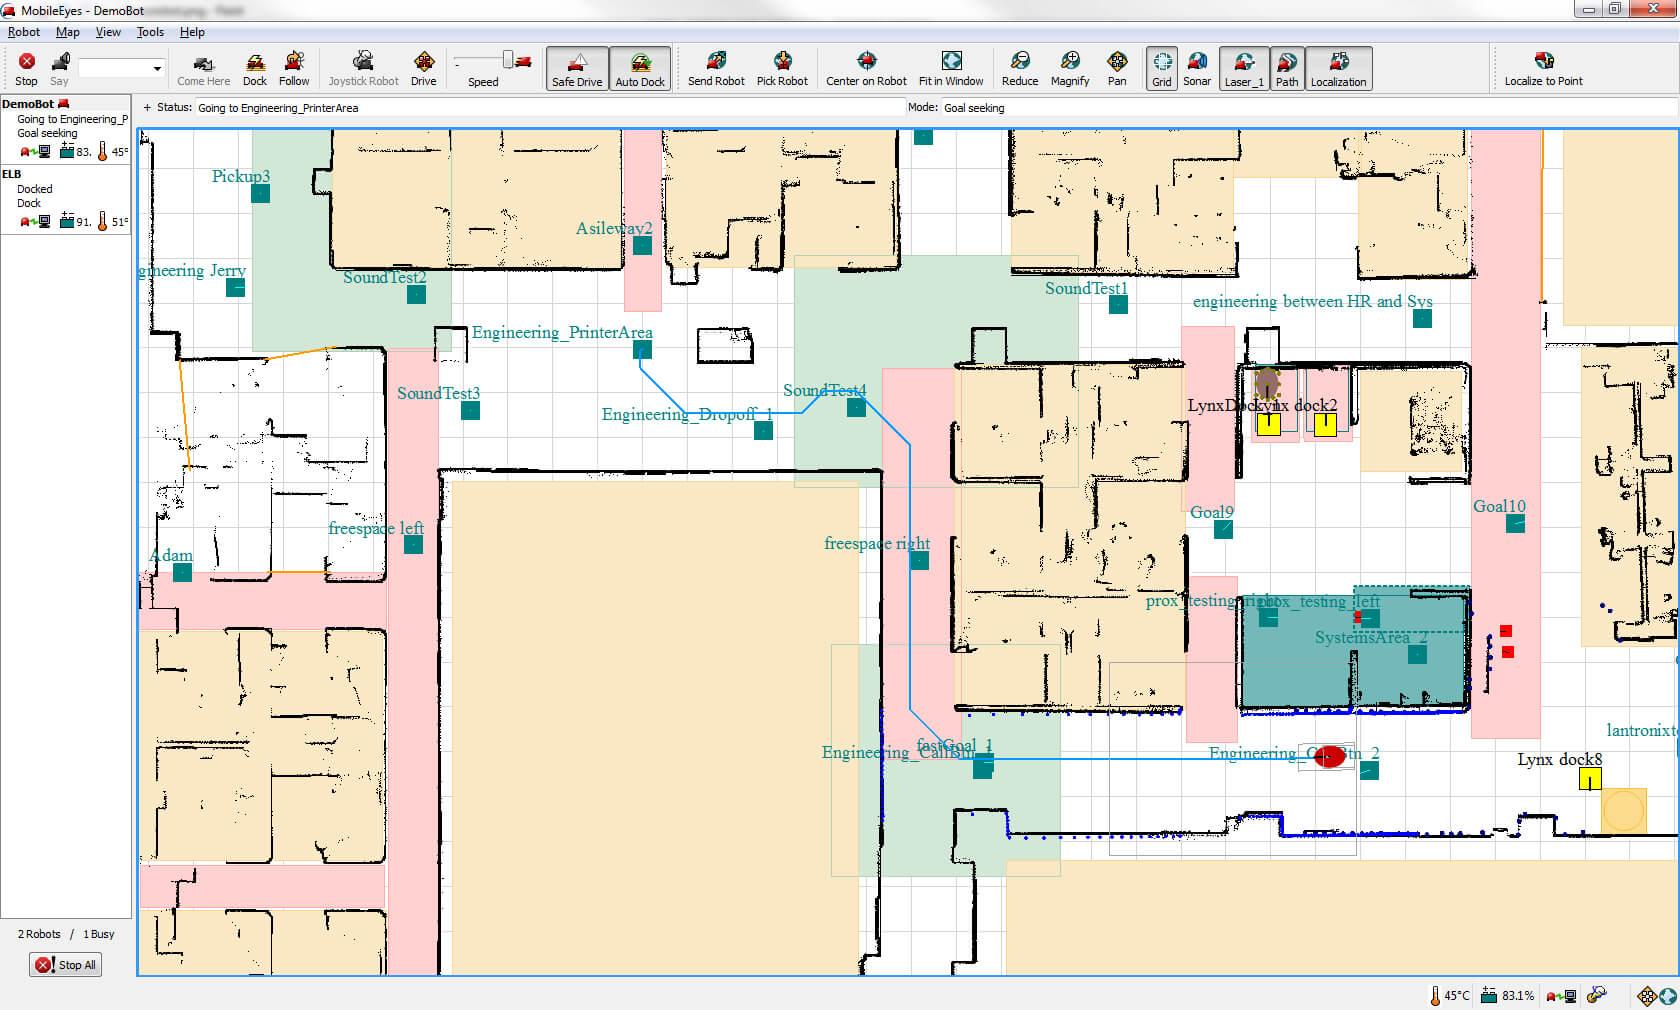 Flexiblemapping prod 190x232